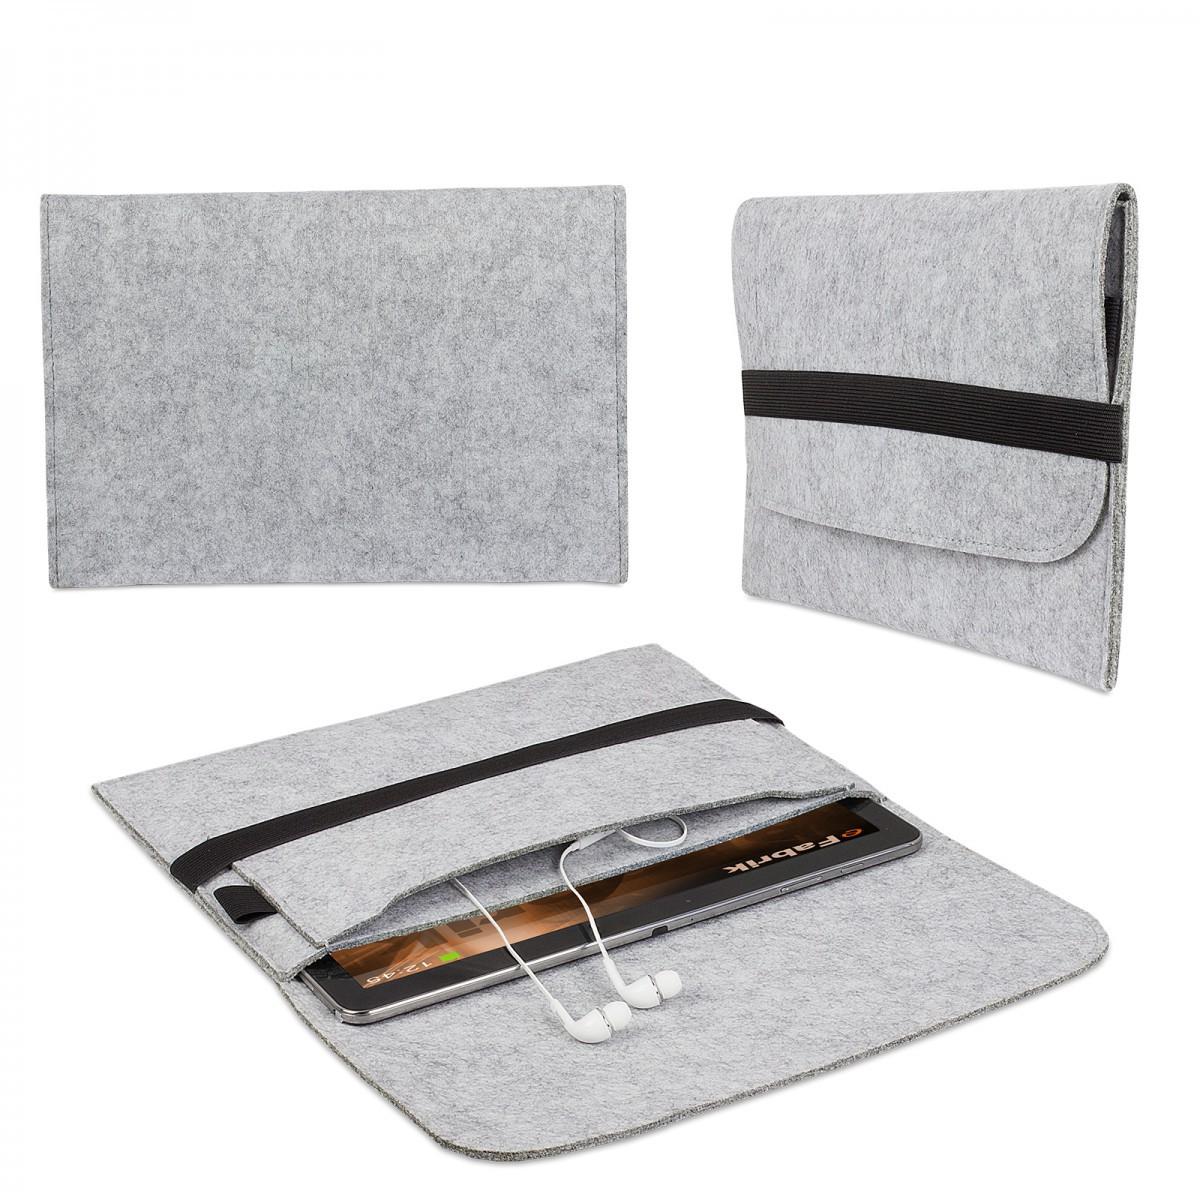 efabrik schutztasche f r apple macbook air 11 schutzh lle h lle tasche notebooktasche soft cover. Black Bedroom Furniture Sets. Home Design Ideas